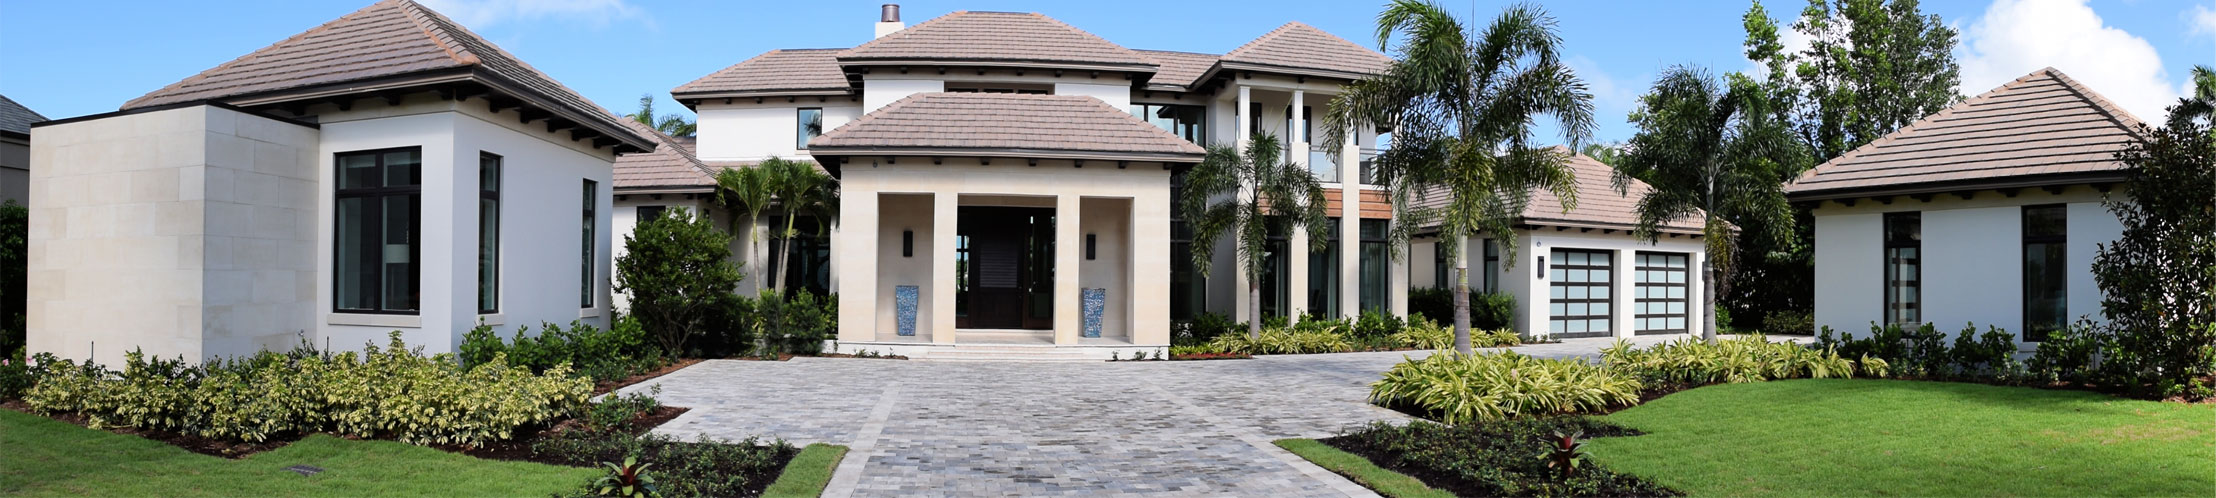 Large, Beige Home | Precast Keystone - Naples, Florida